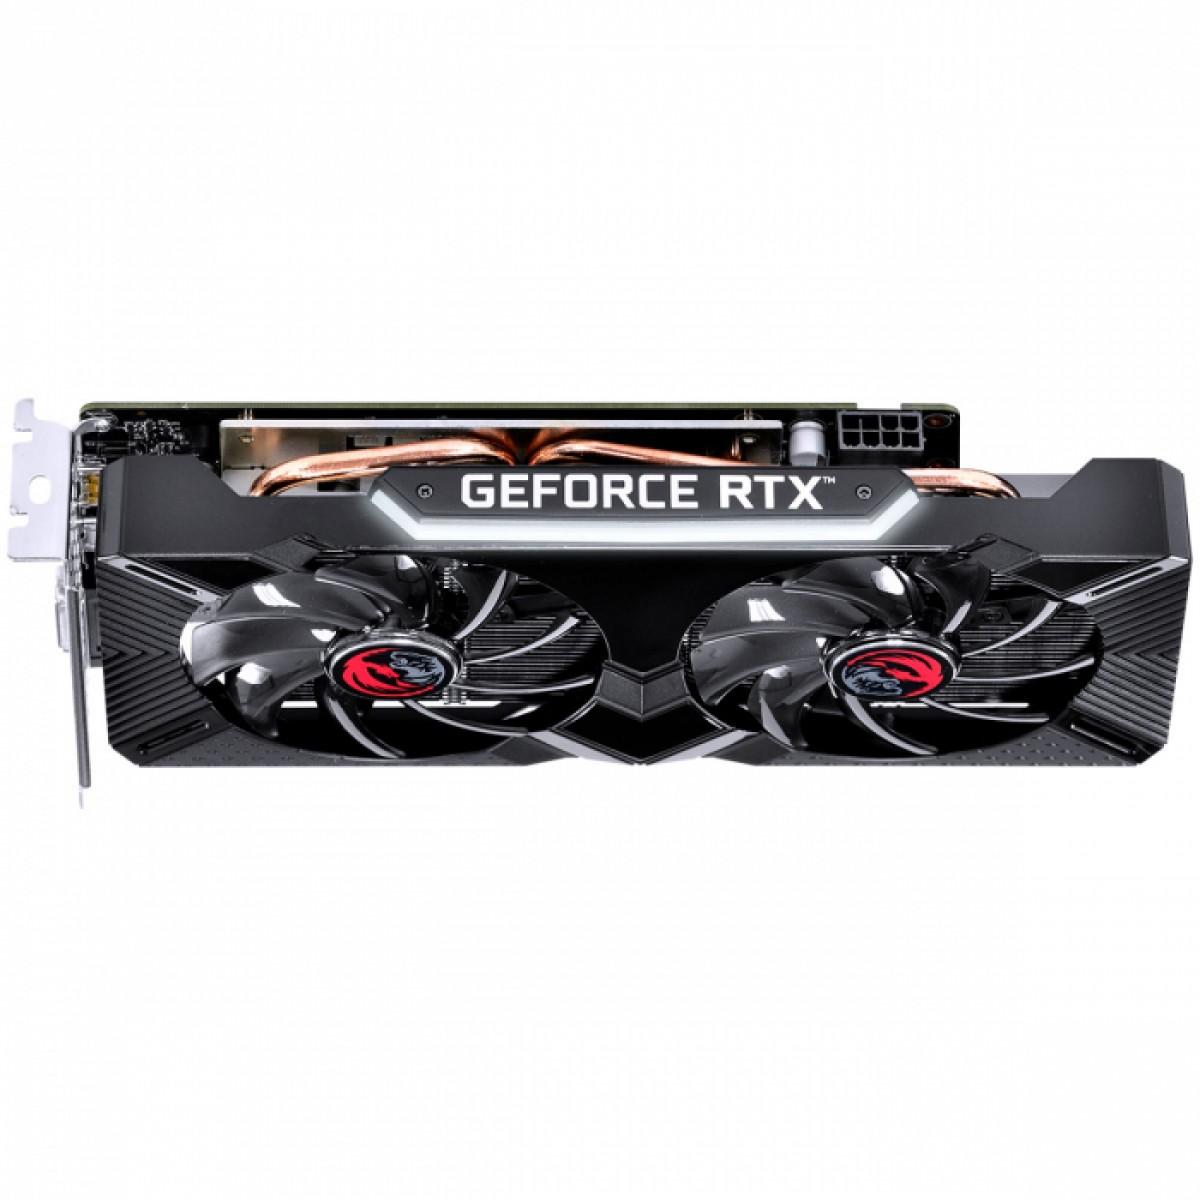 Placa de Vídeo PCYes, GeForce RTX 2060 Dual OC, Graffiti Series, 6GB, GDDR6, 192Bit, PPGF2060DR6192